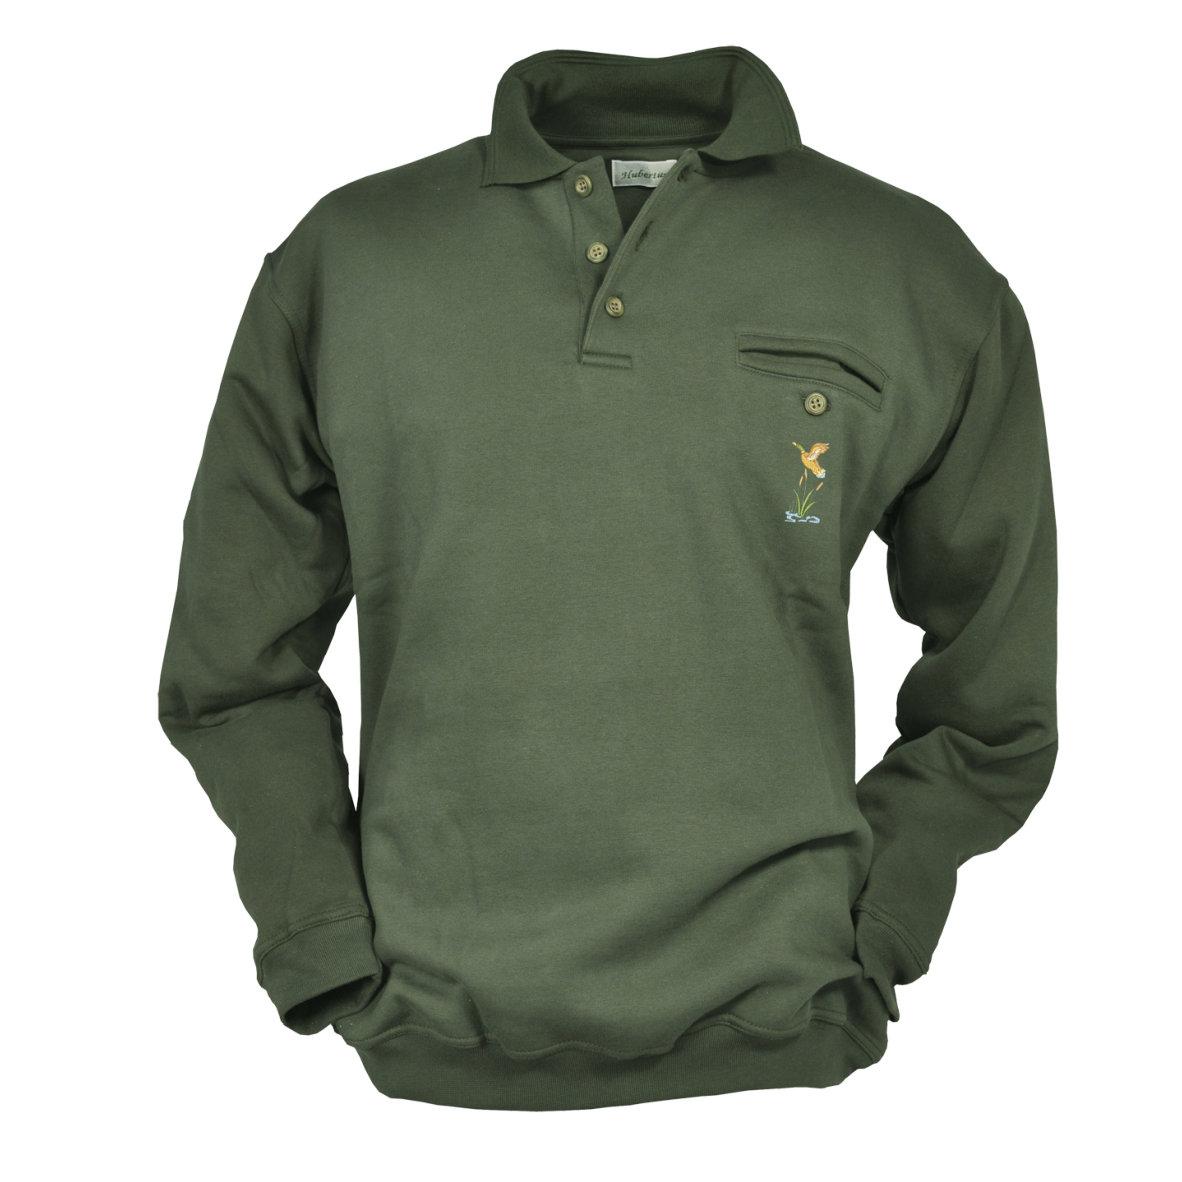 Sweatshirt Polokragen